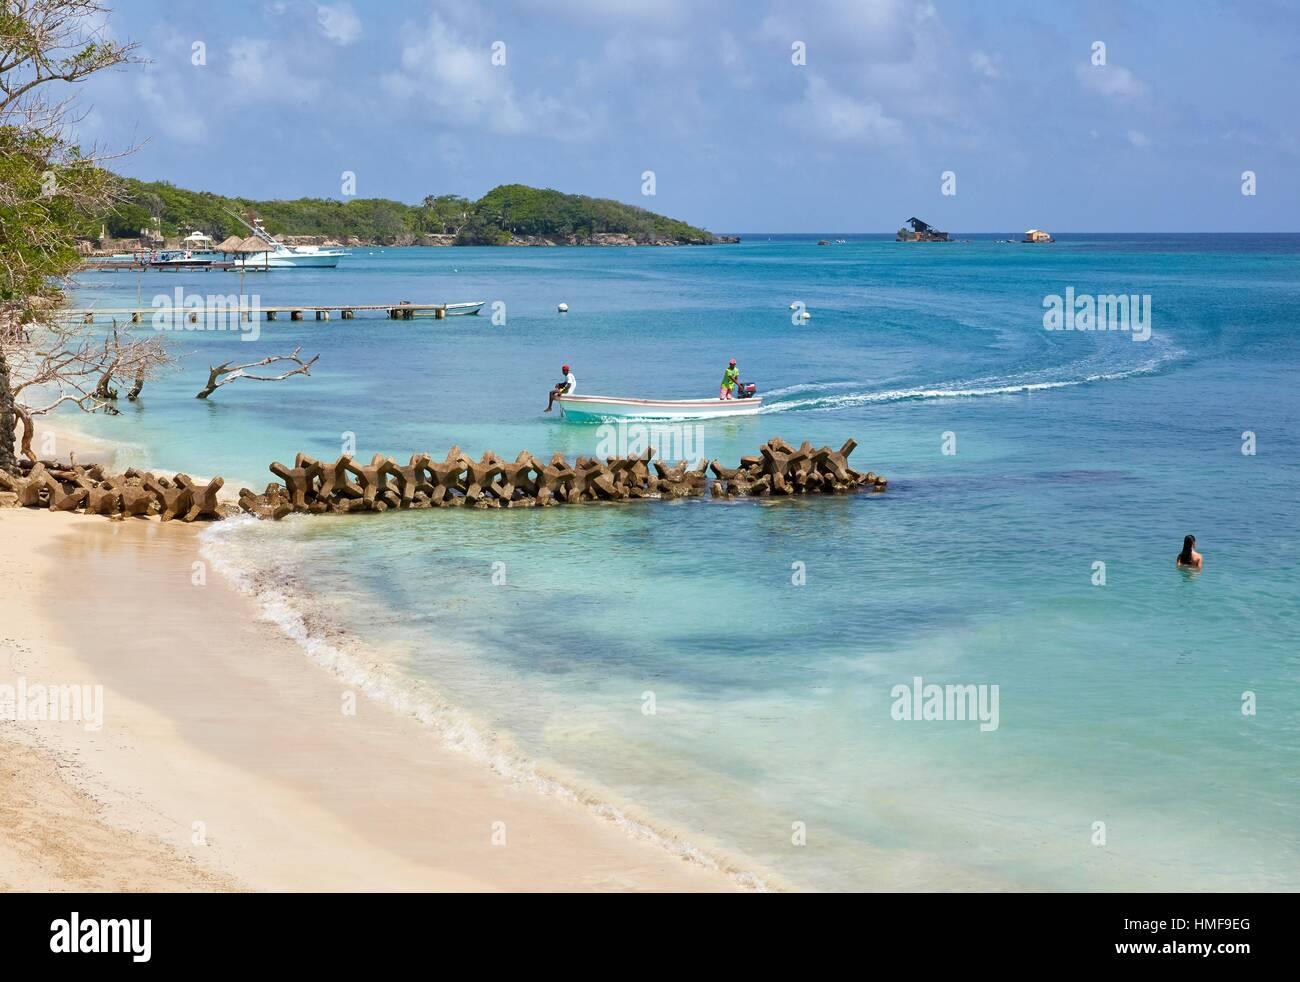 Cartagena Islands